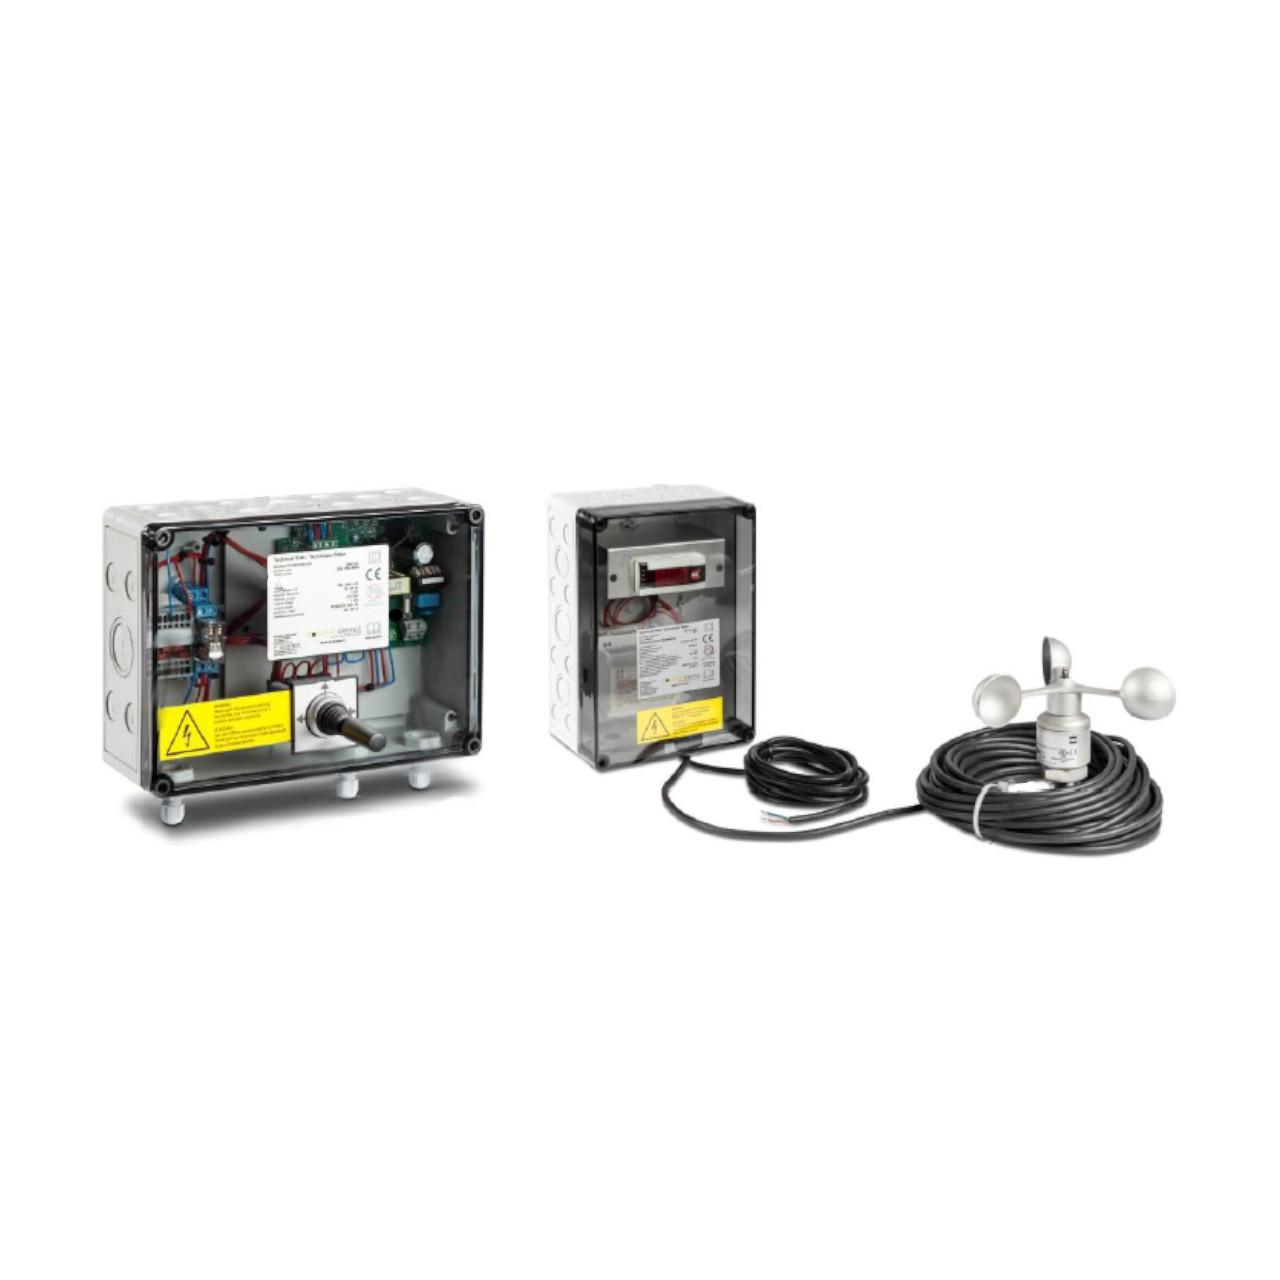 Deger - Central Control Box III w/ Windguard